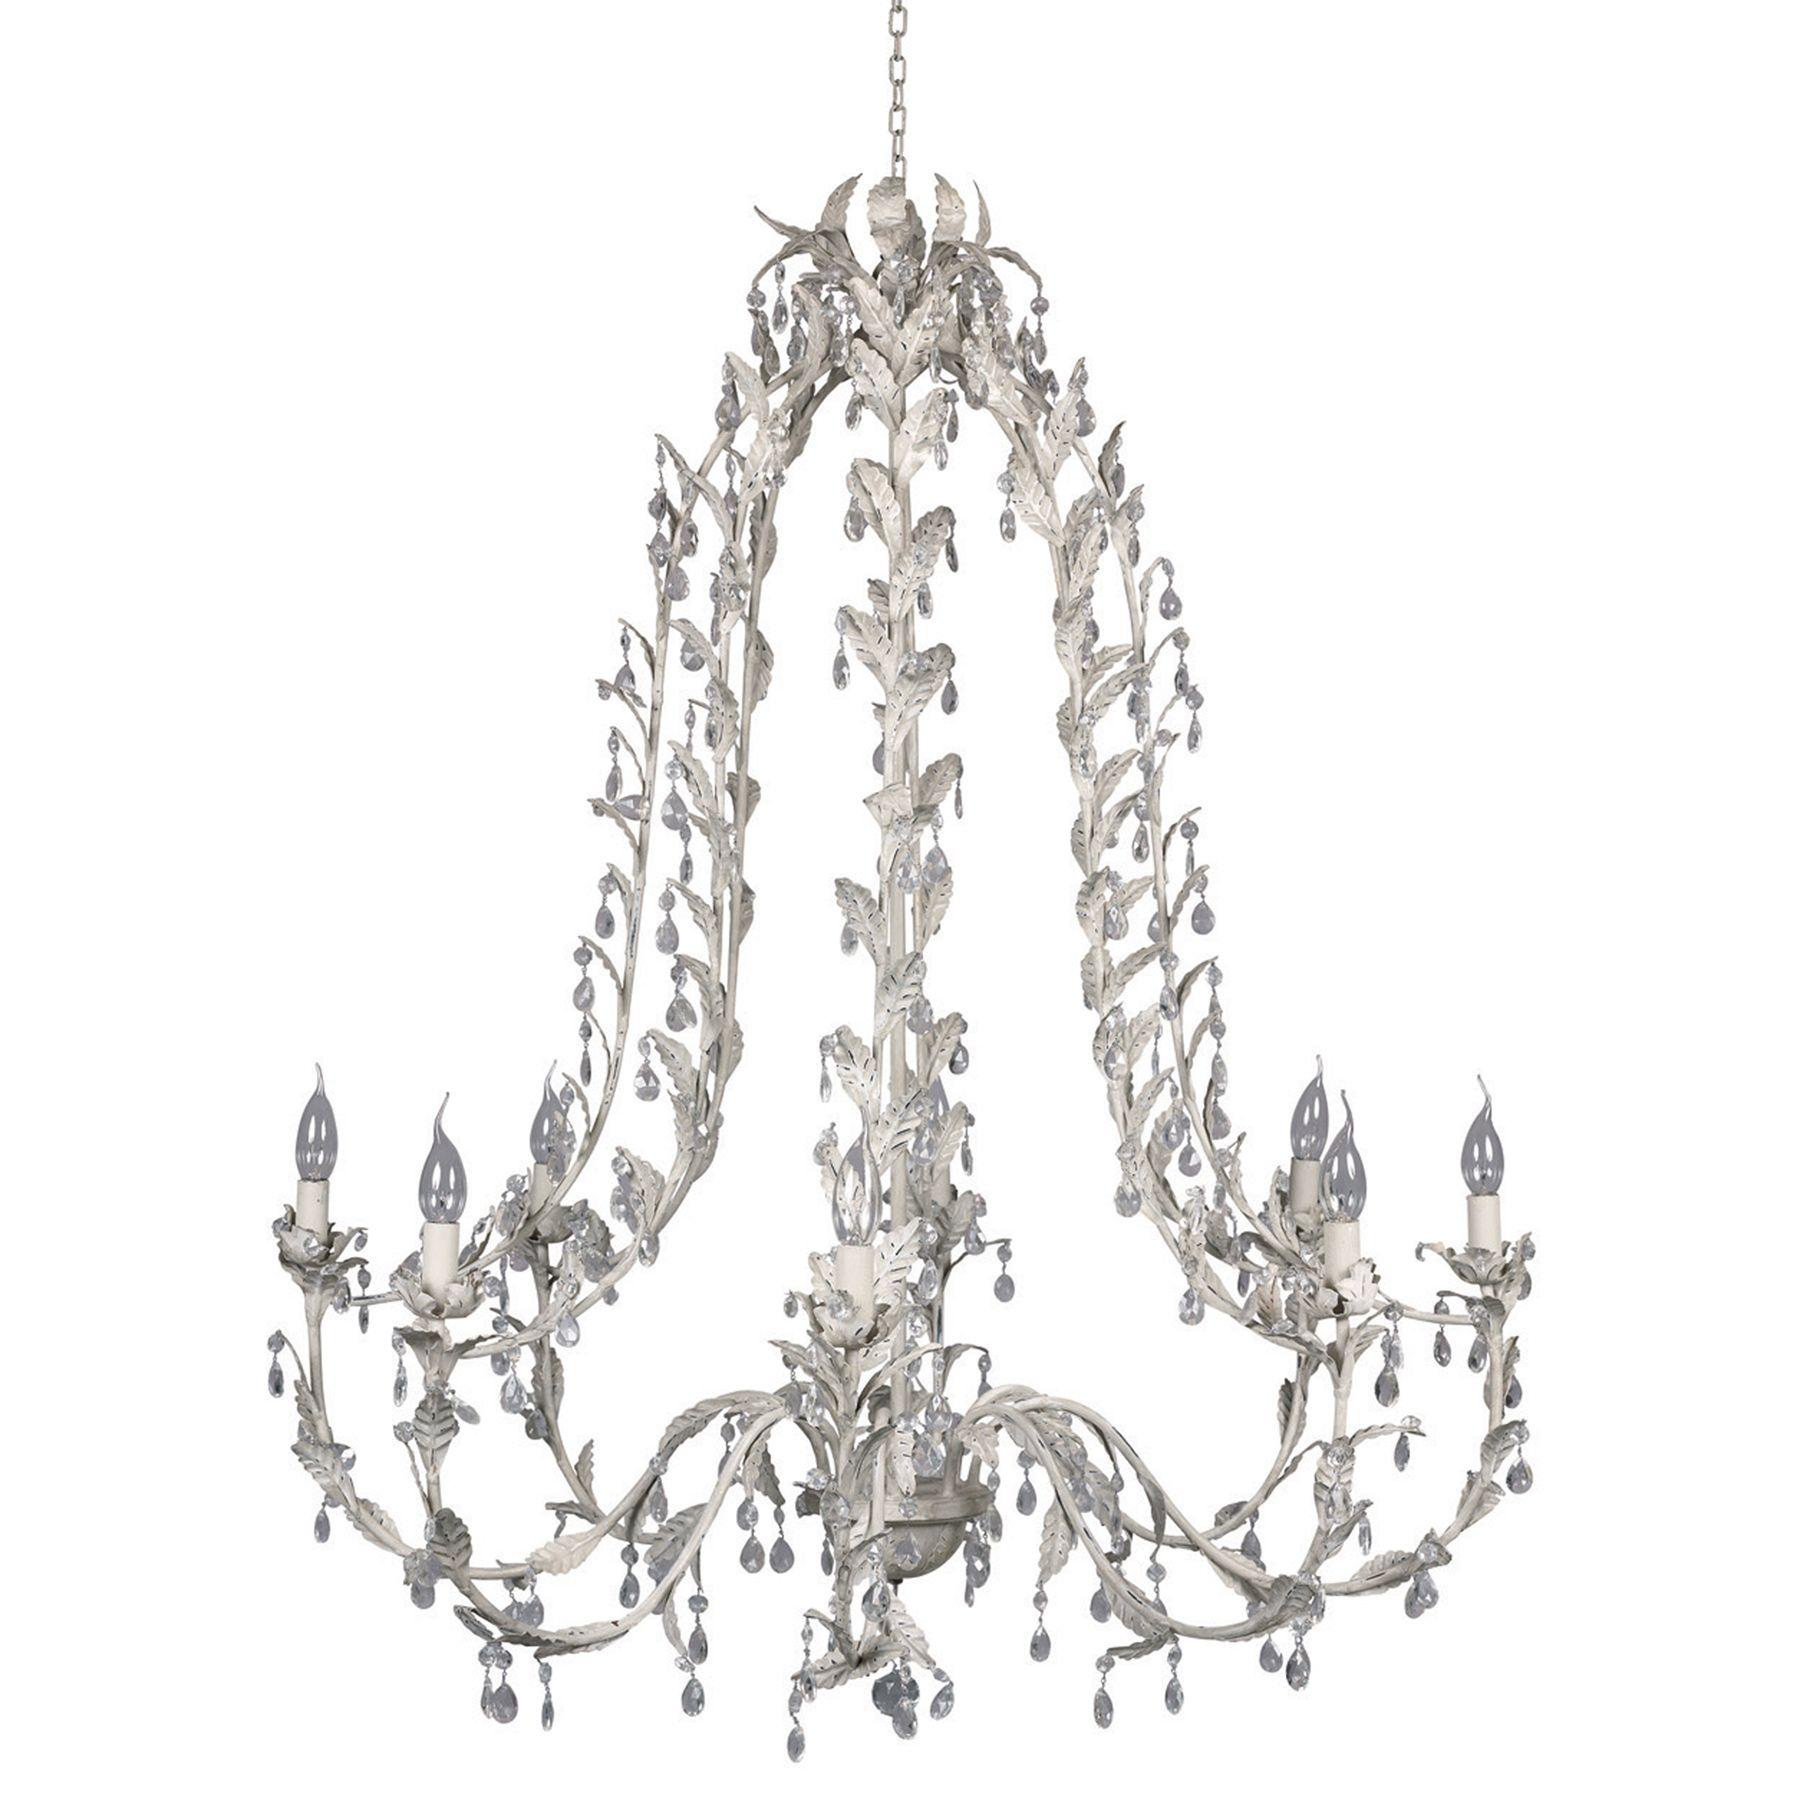 Chandelier elise xxl hermitage kitchen pinterest chandeliers chandelier elise xxl arubaitofo Image collections